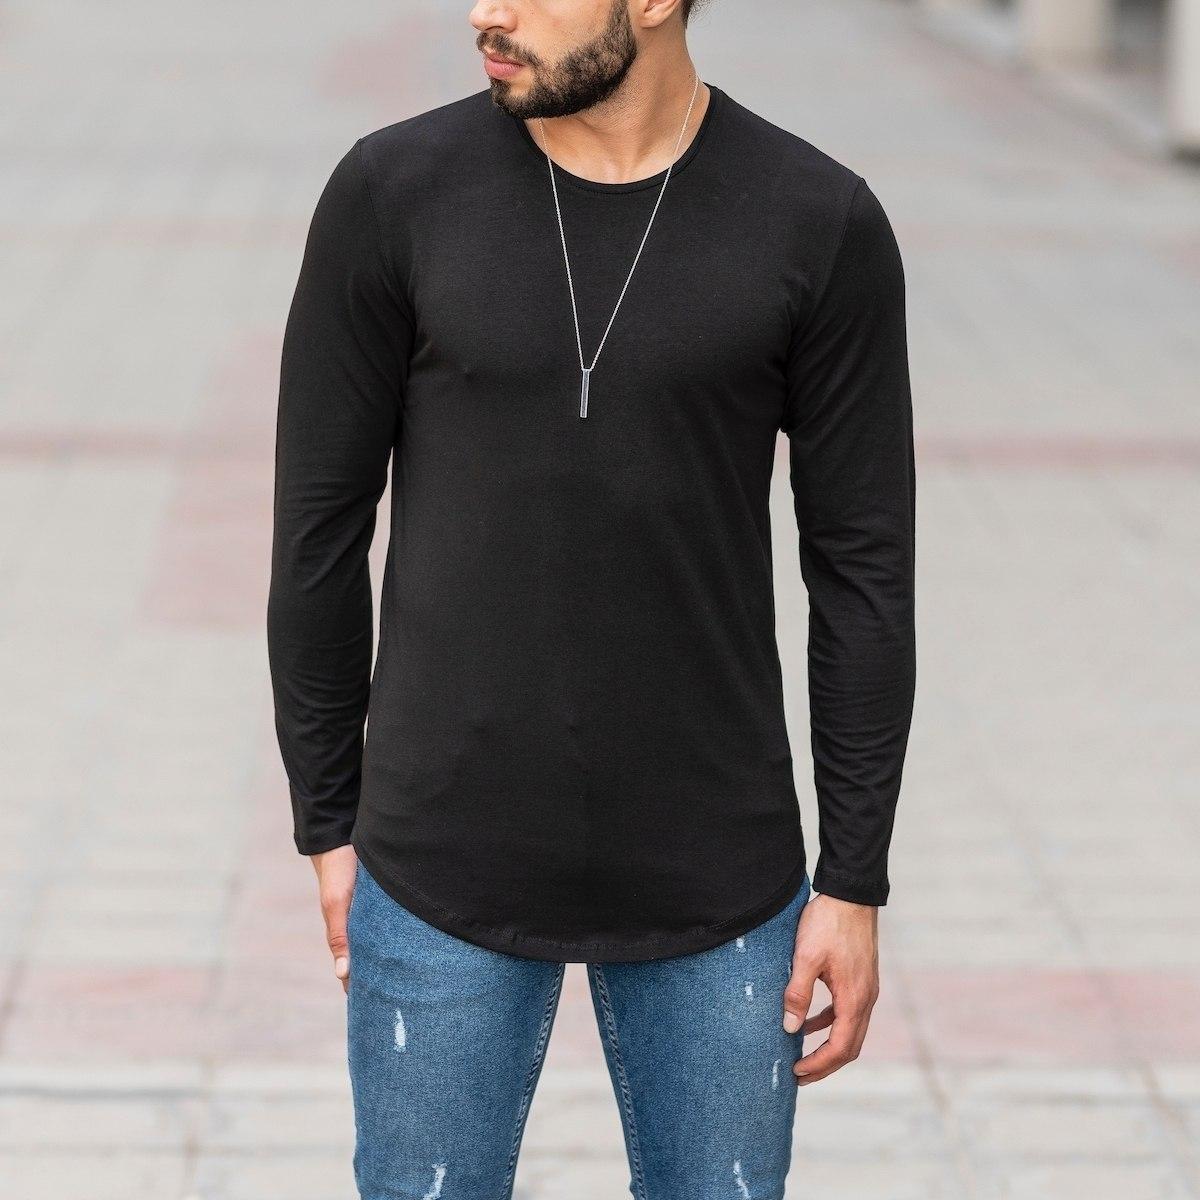 Basic Sweatshirt In Black Mv Premium Brand - 1